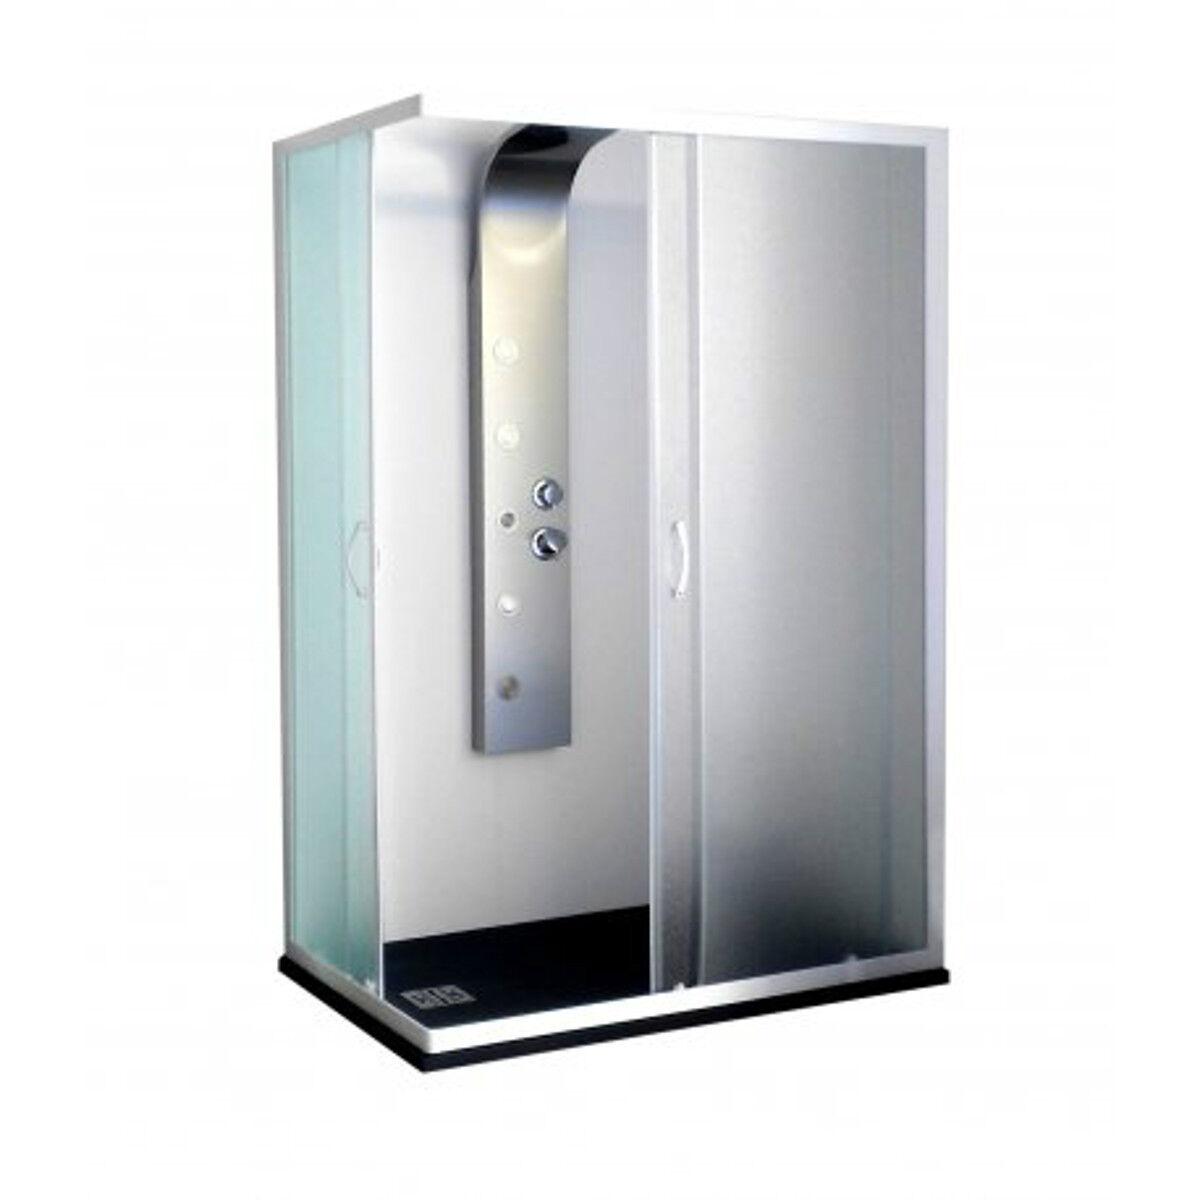 BOX DOCCIA BAGNO ANGOLARE BIANCO 80X100 80X120 80X80 75X75 OPACO 4 mm. H 185 cm